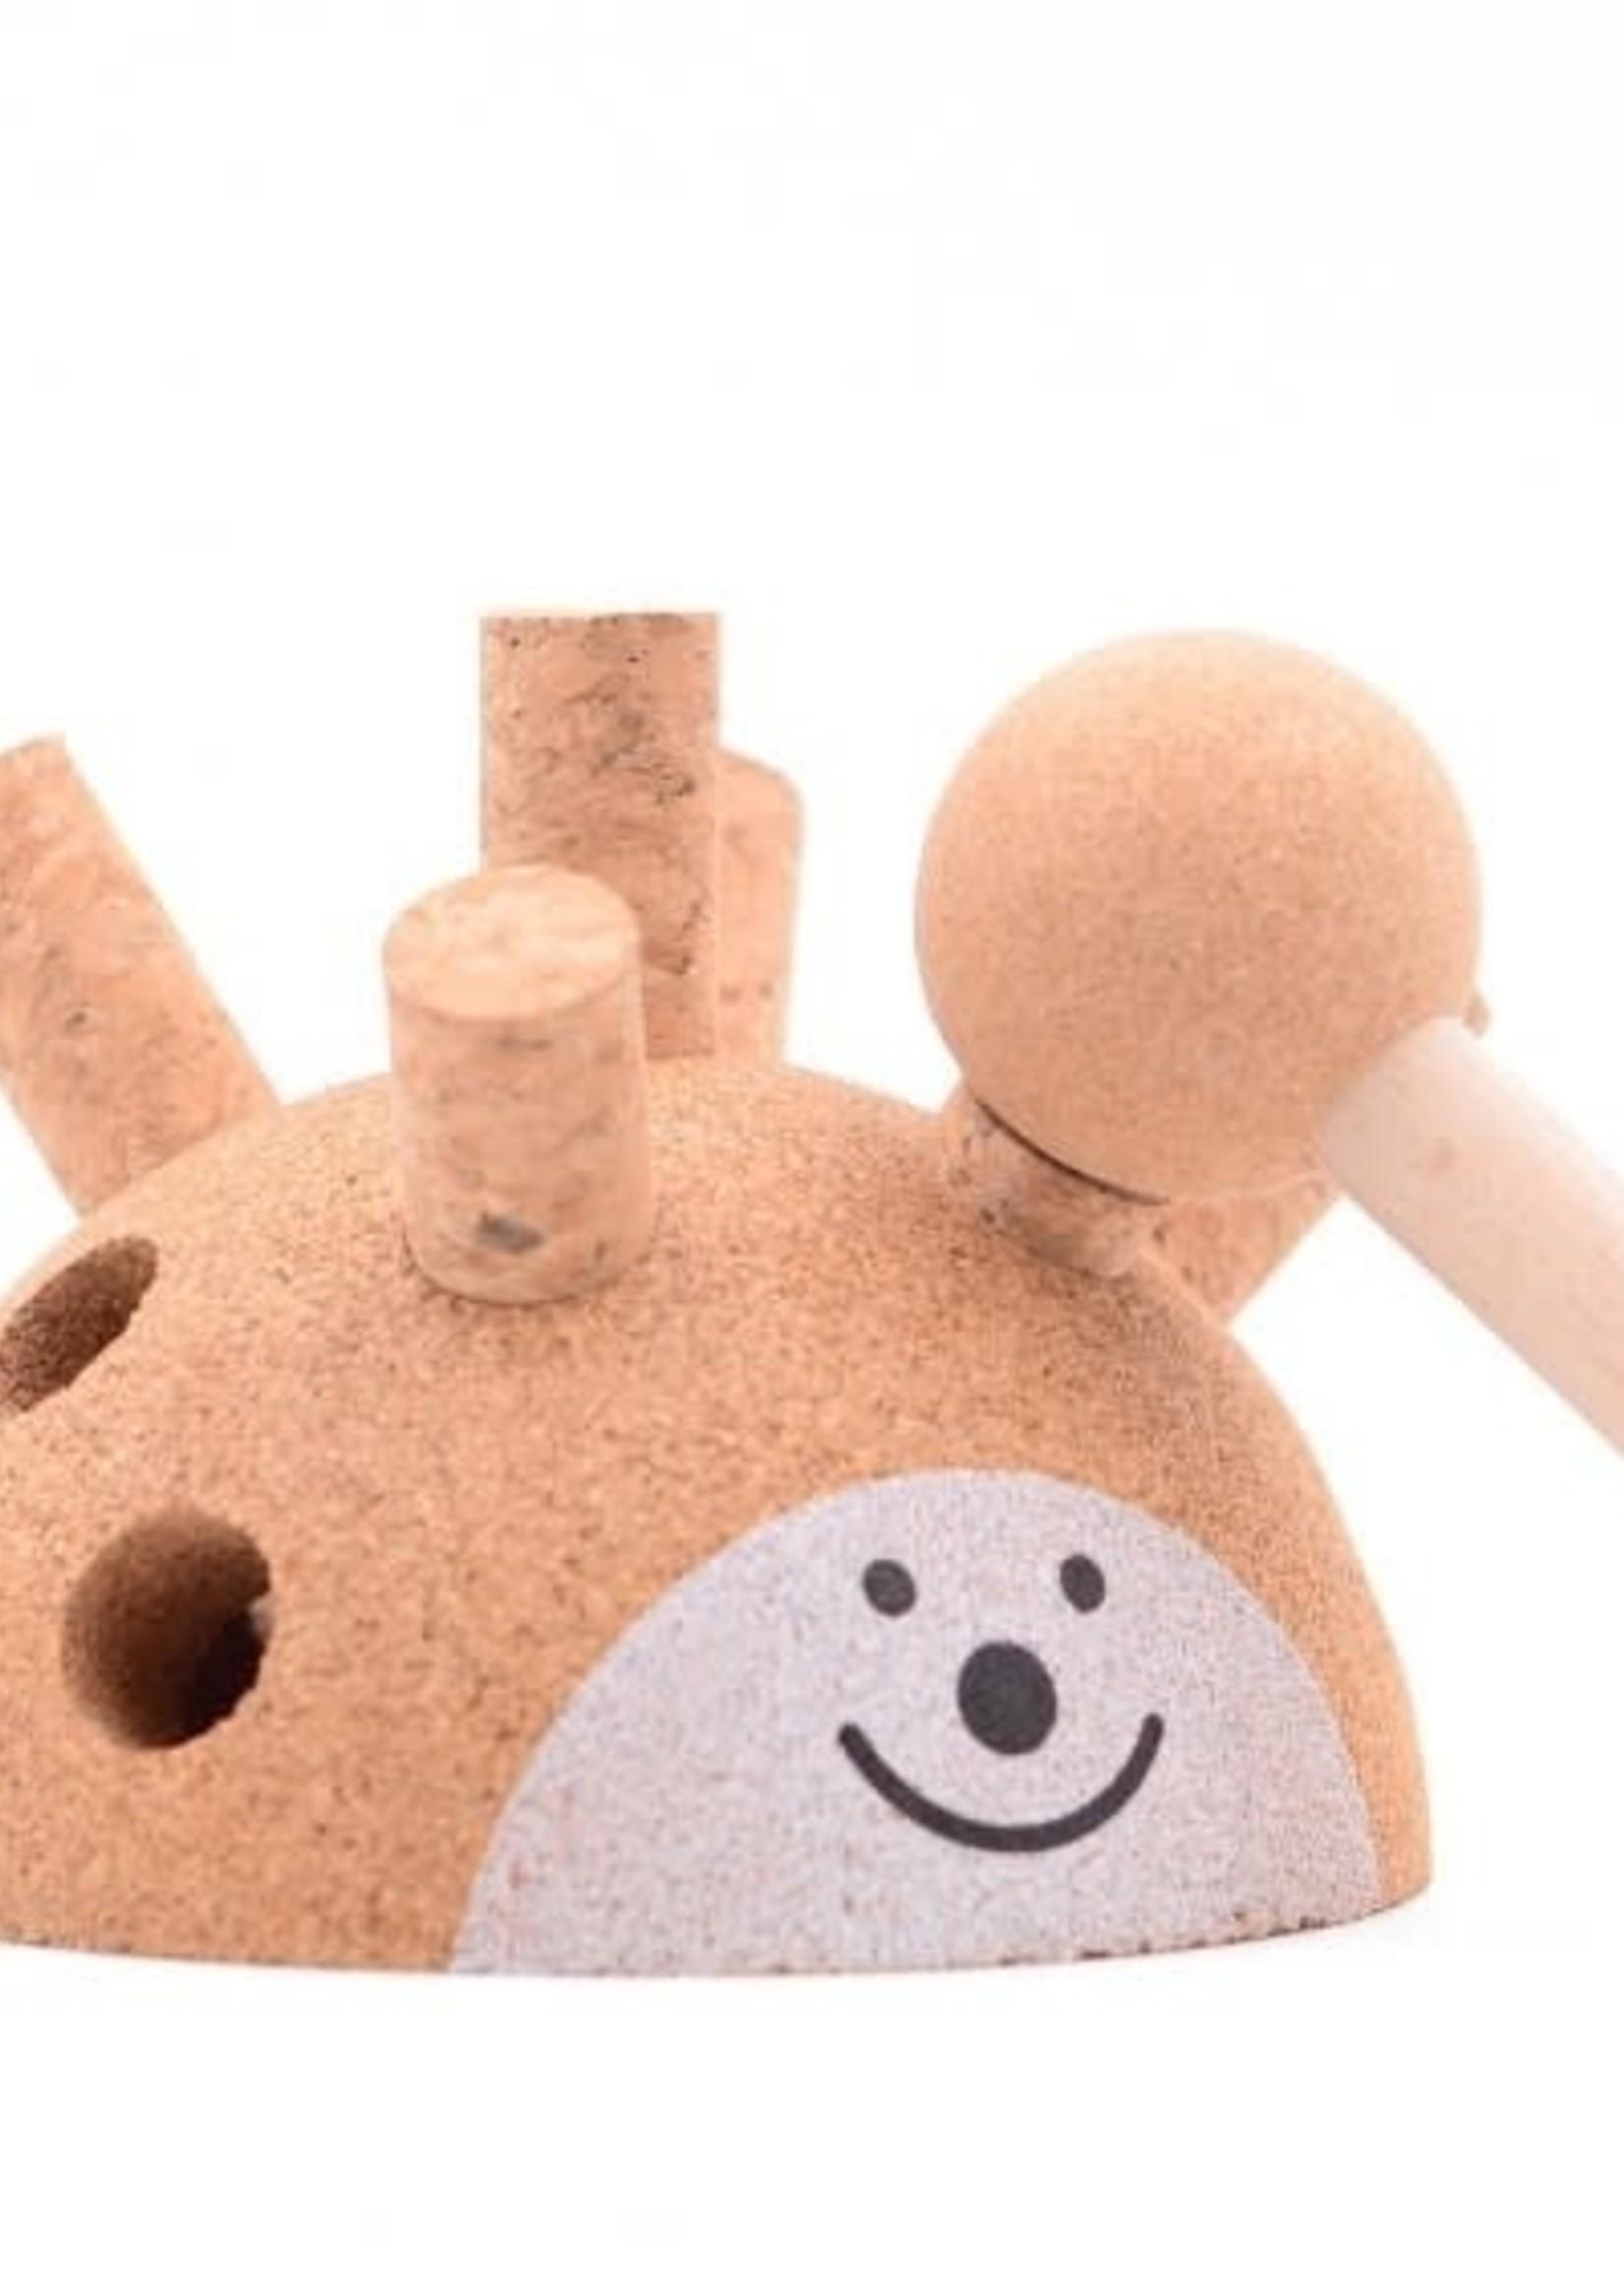 Elou Cork Toys Kurken klopspel Egel